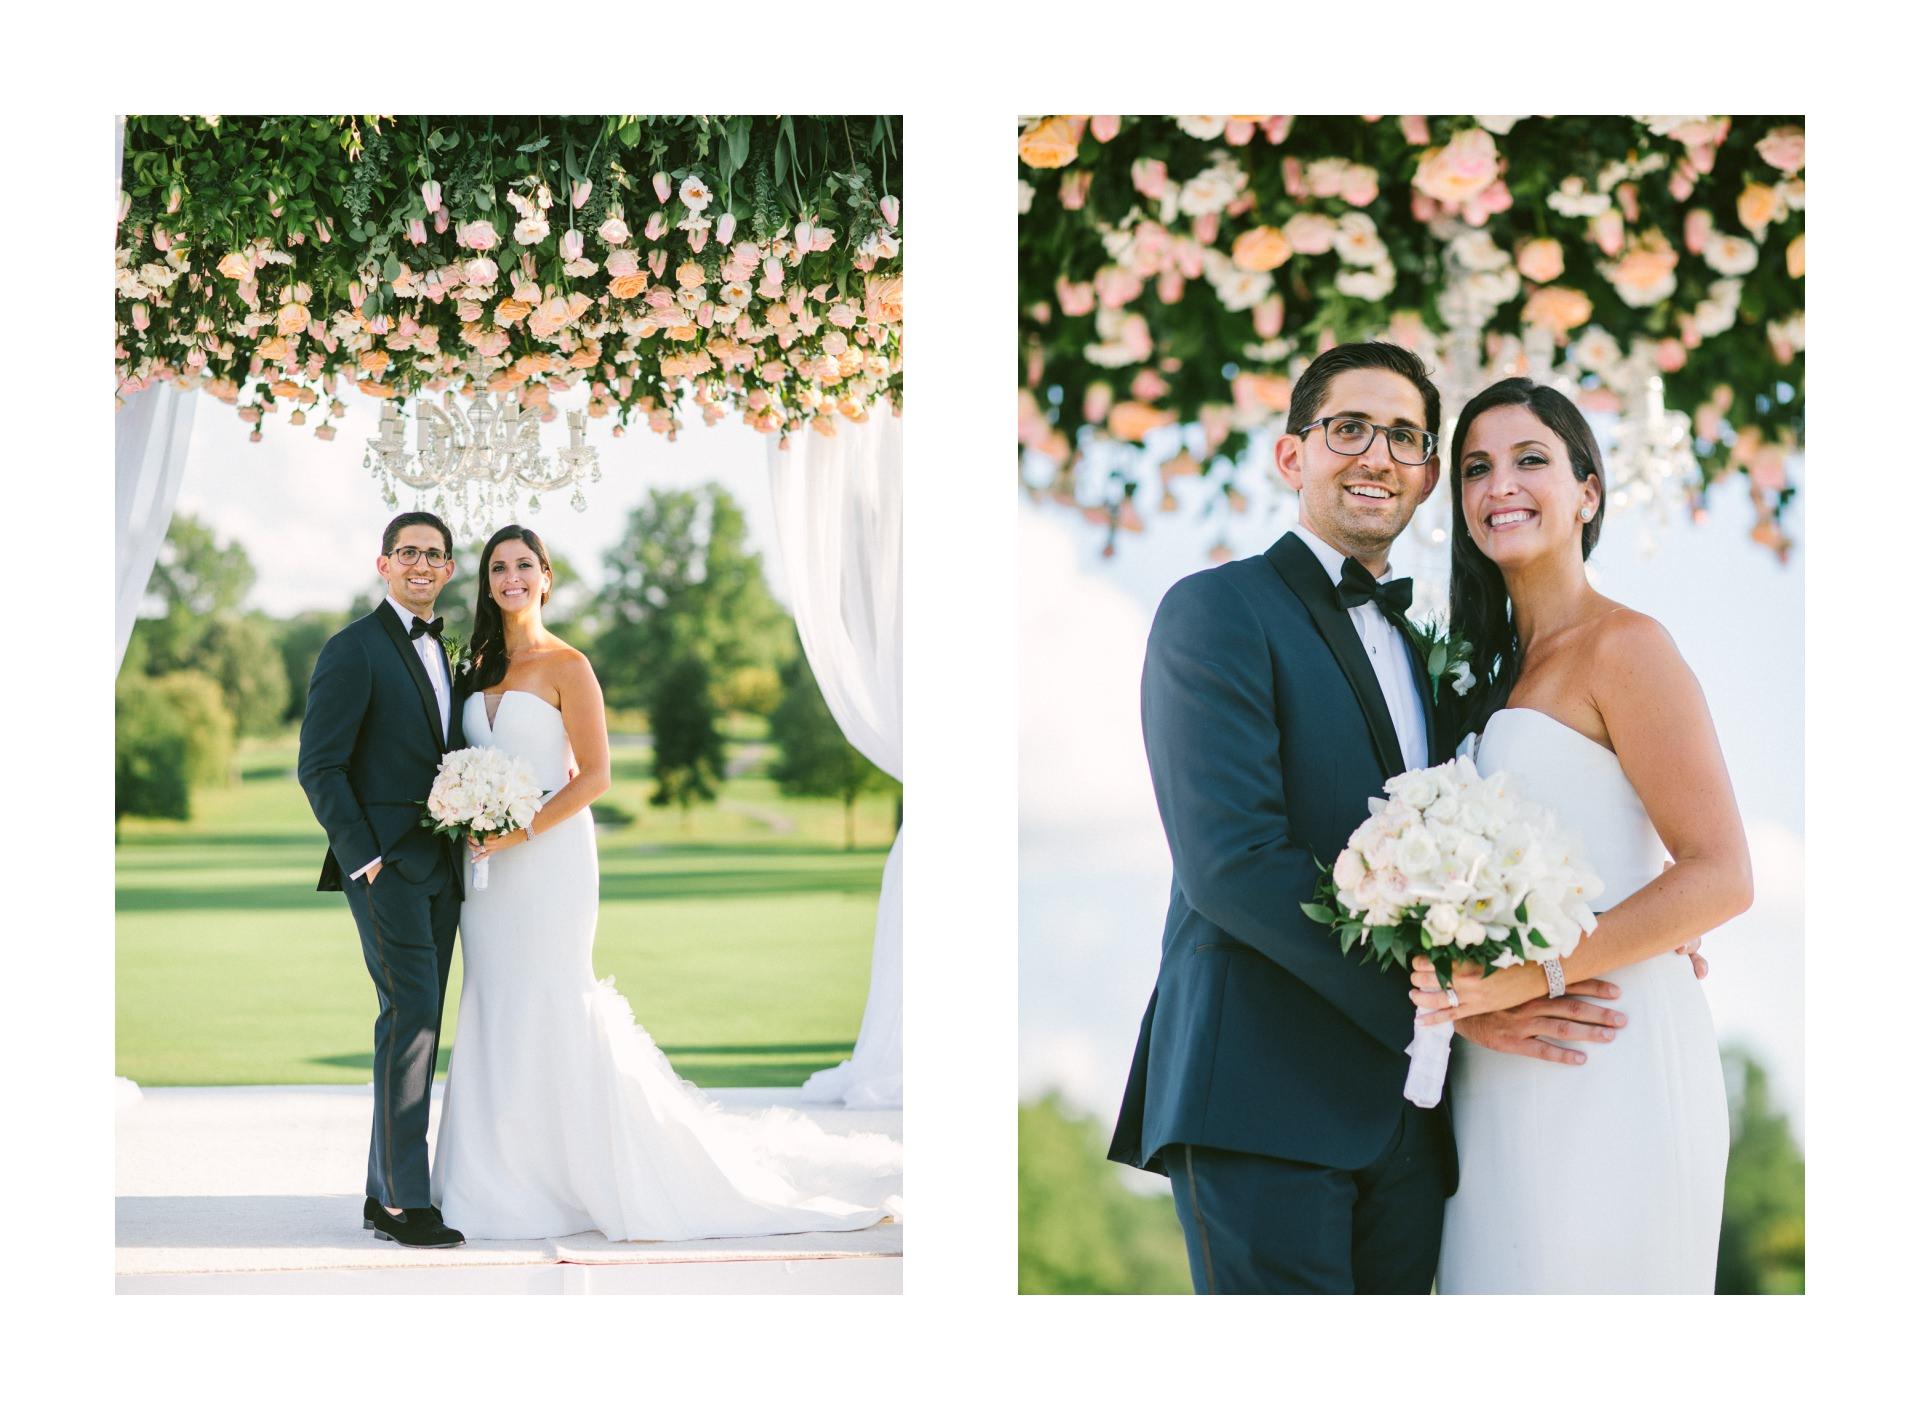 Beechmont Country Club Wedding Photographer in Beachwood 2 38.jpg